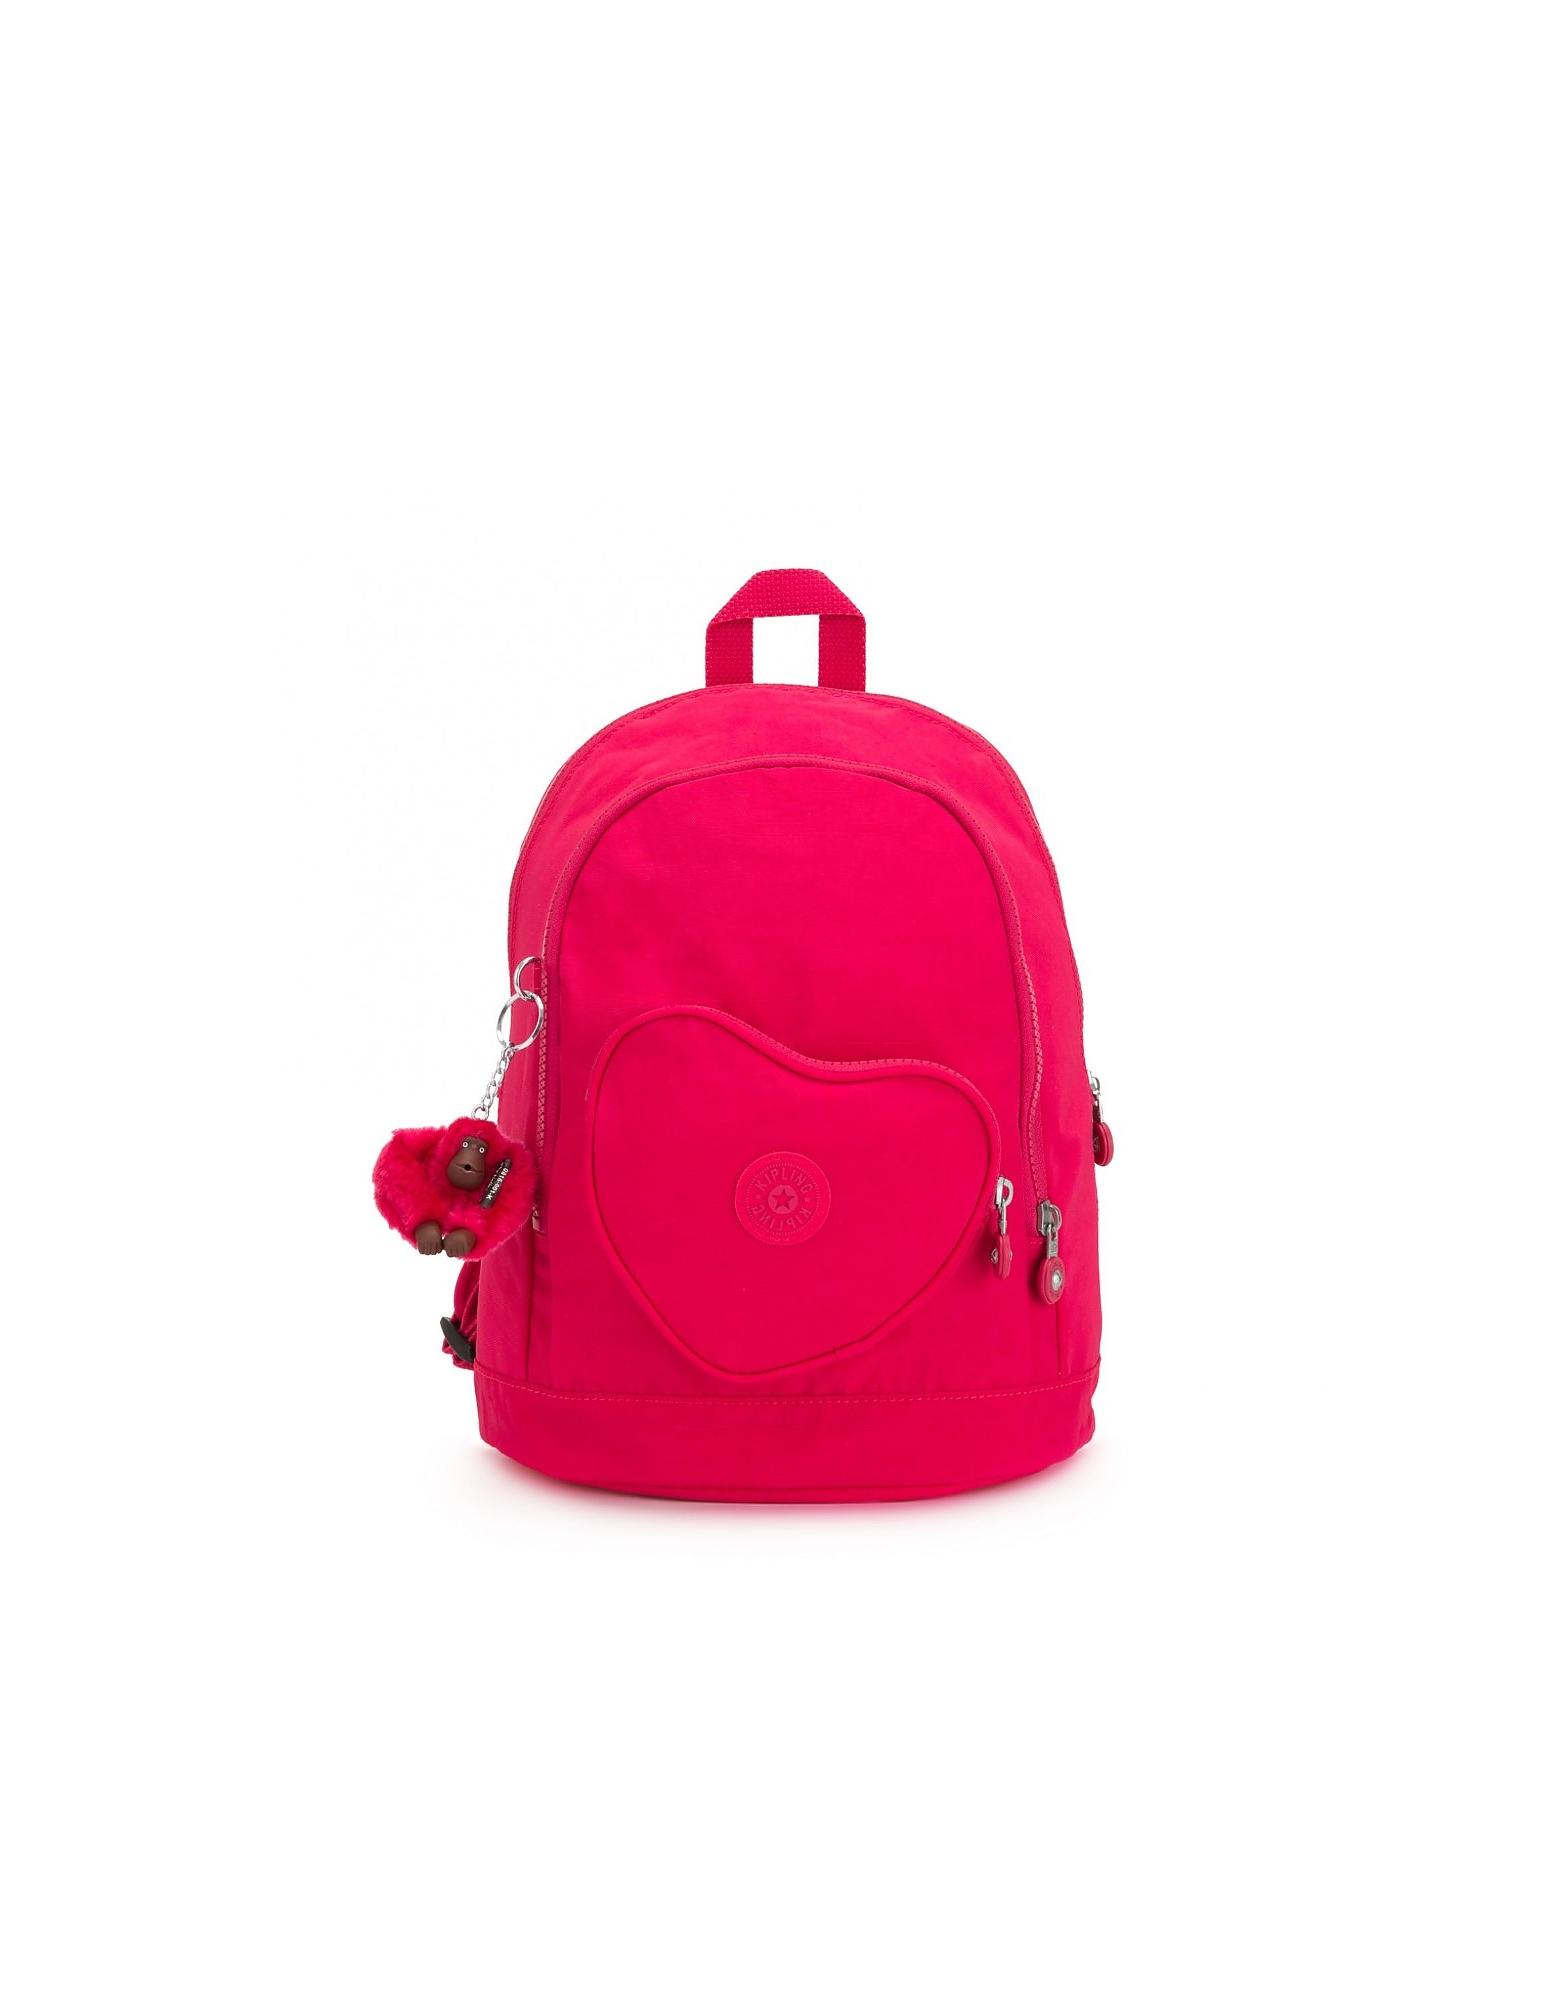 KIPLING 手袋, Women's Pink Backpack